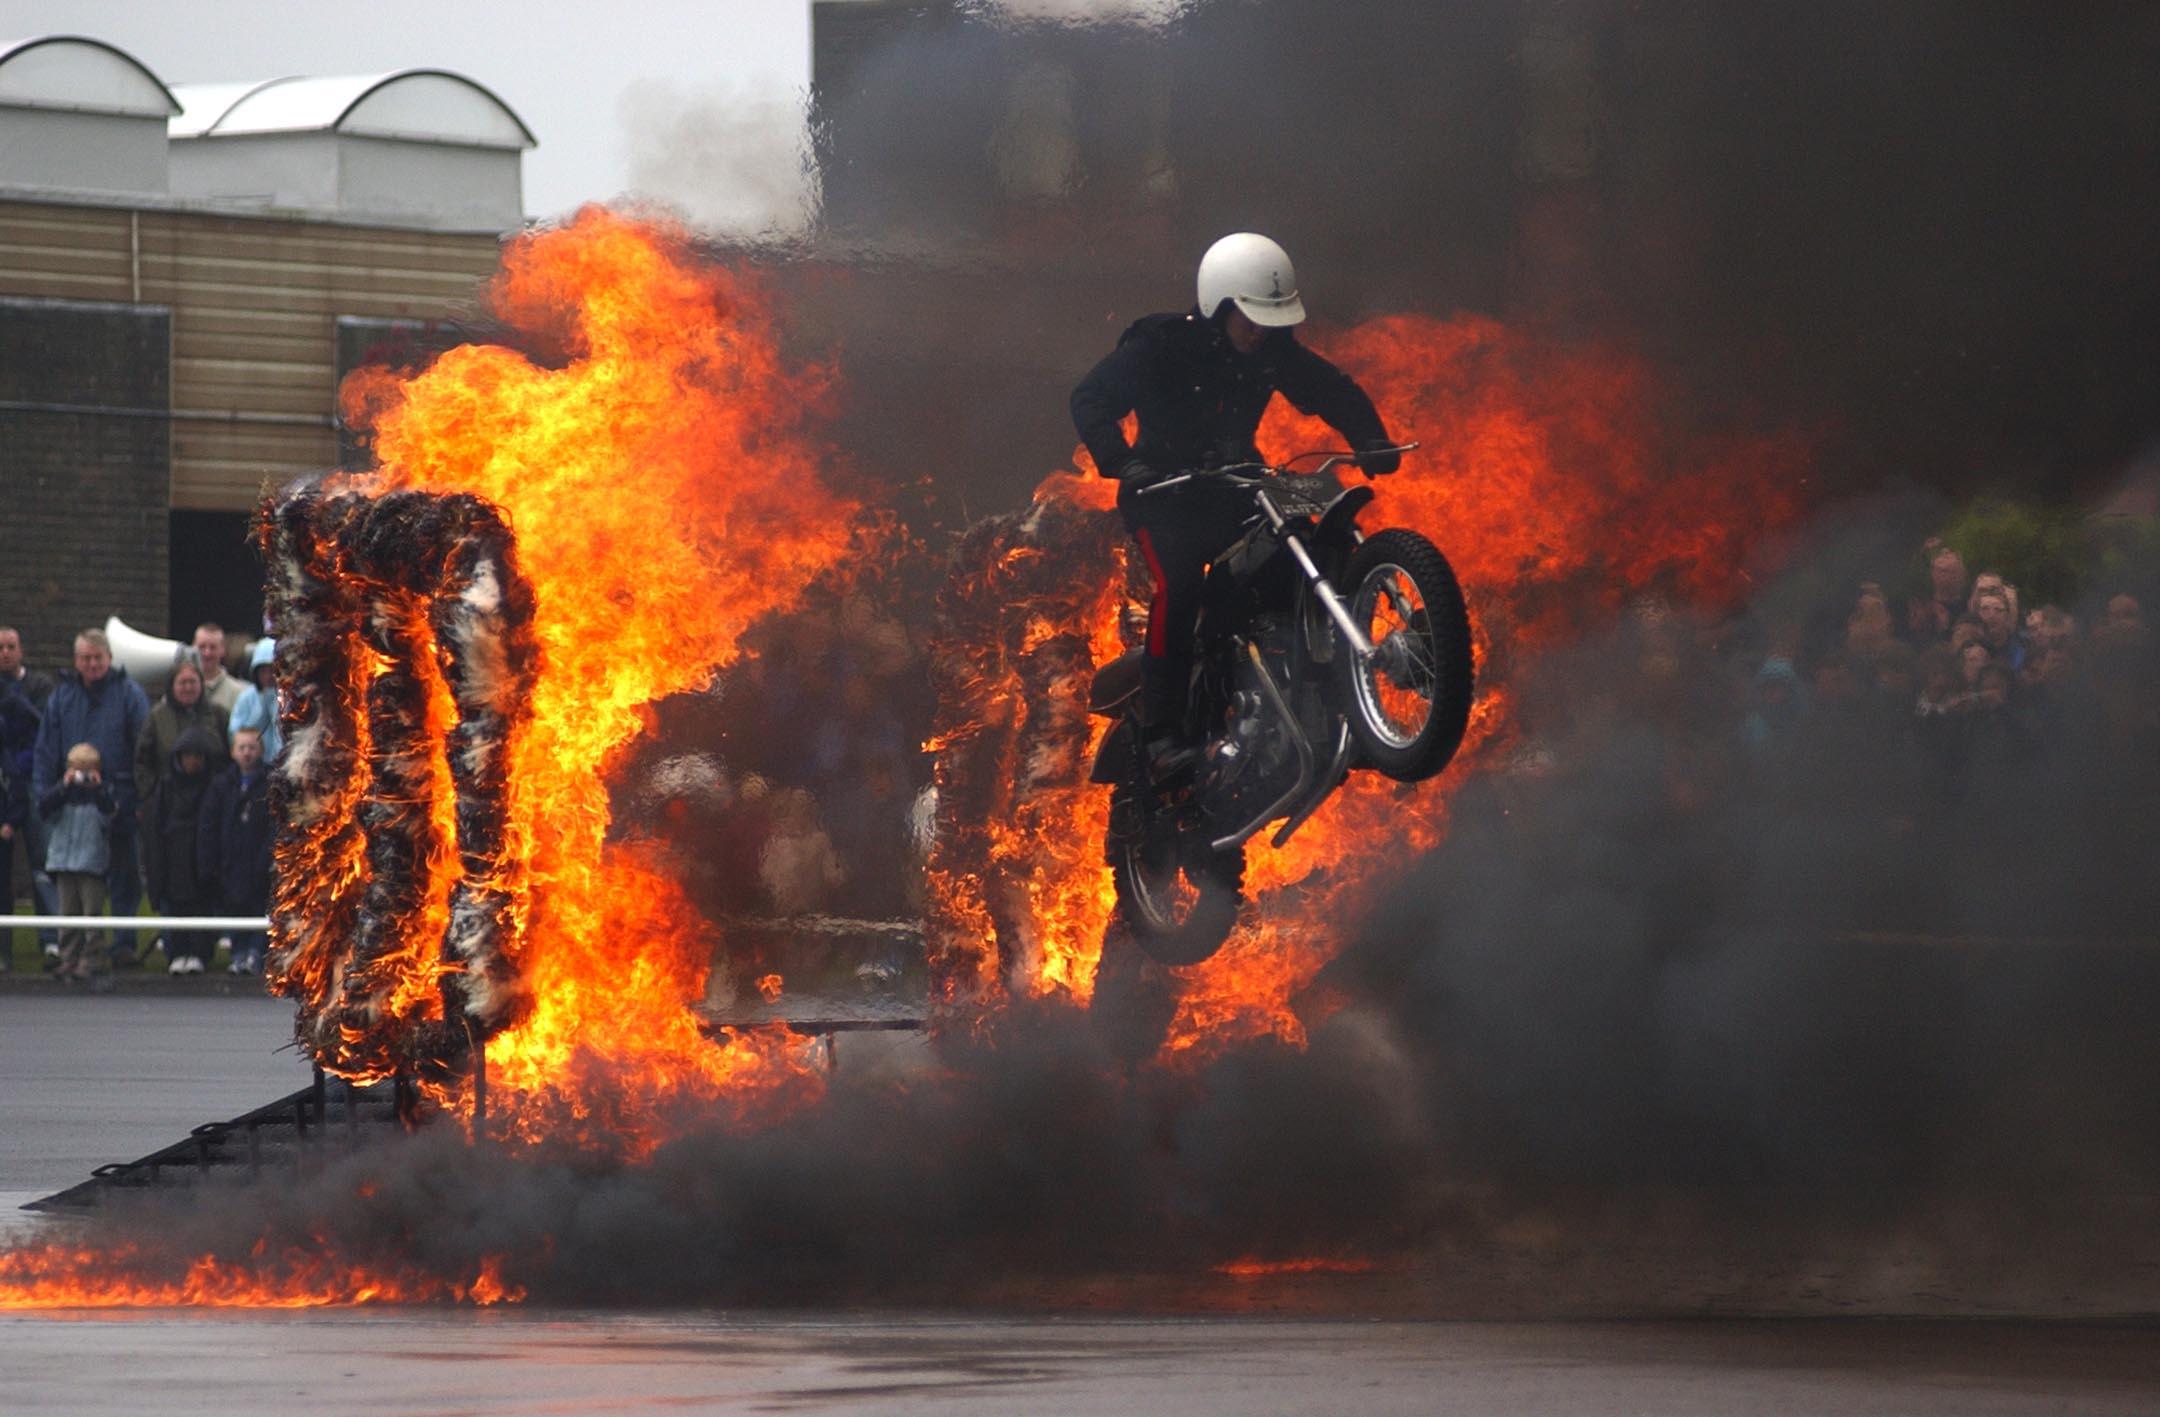 Fire jump White Helmets motorcycle display team